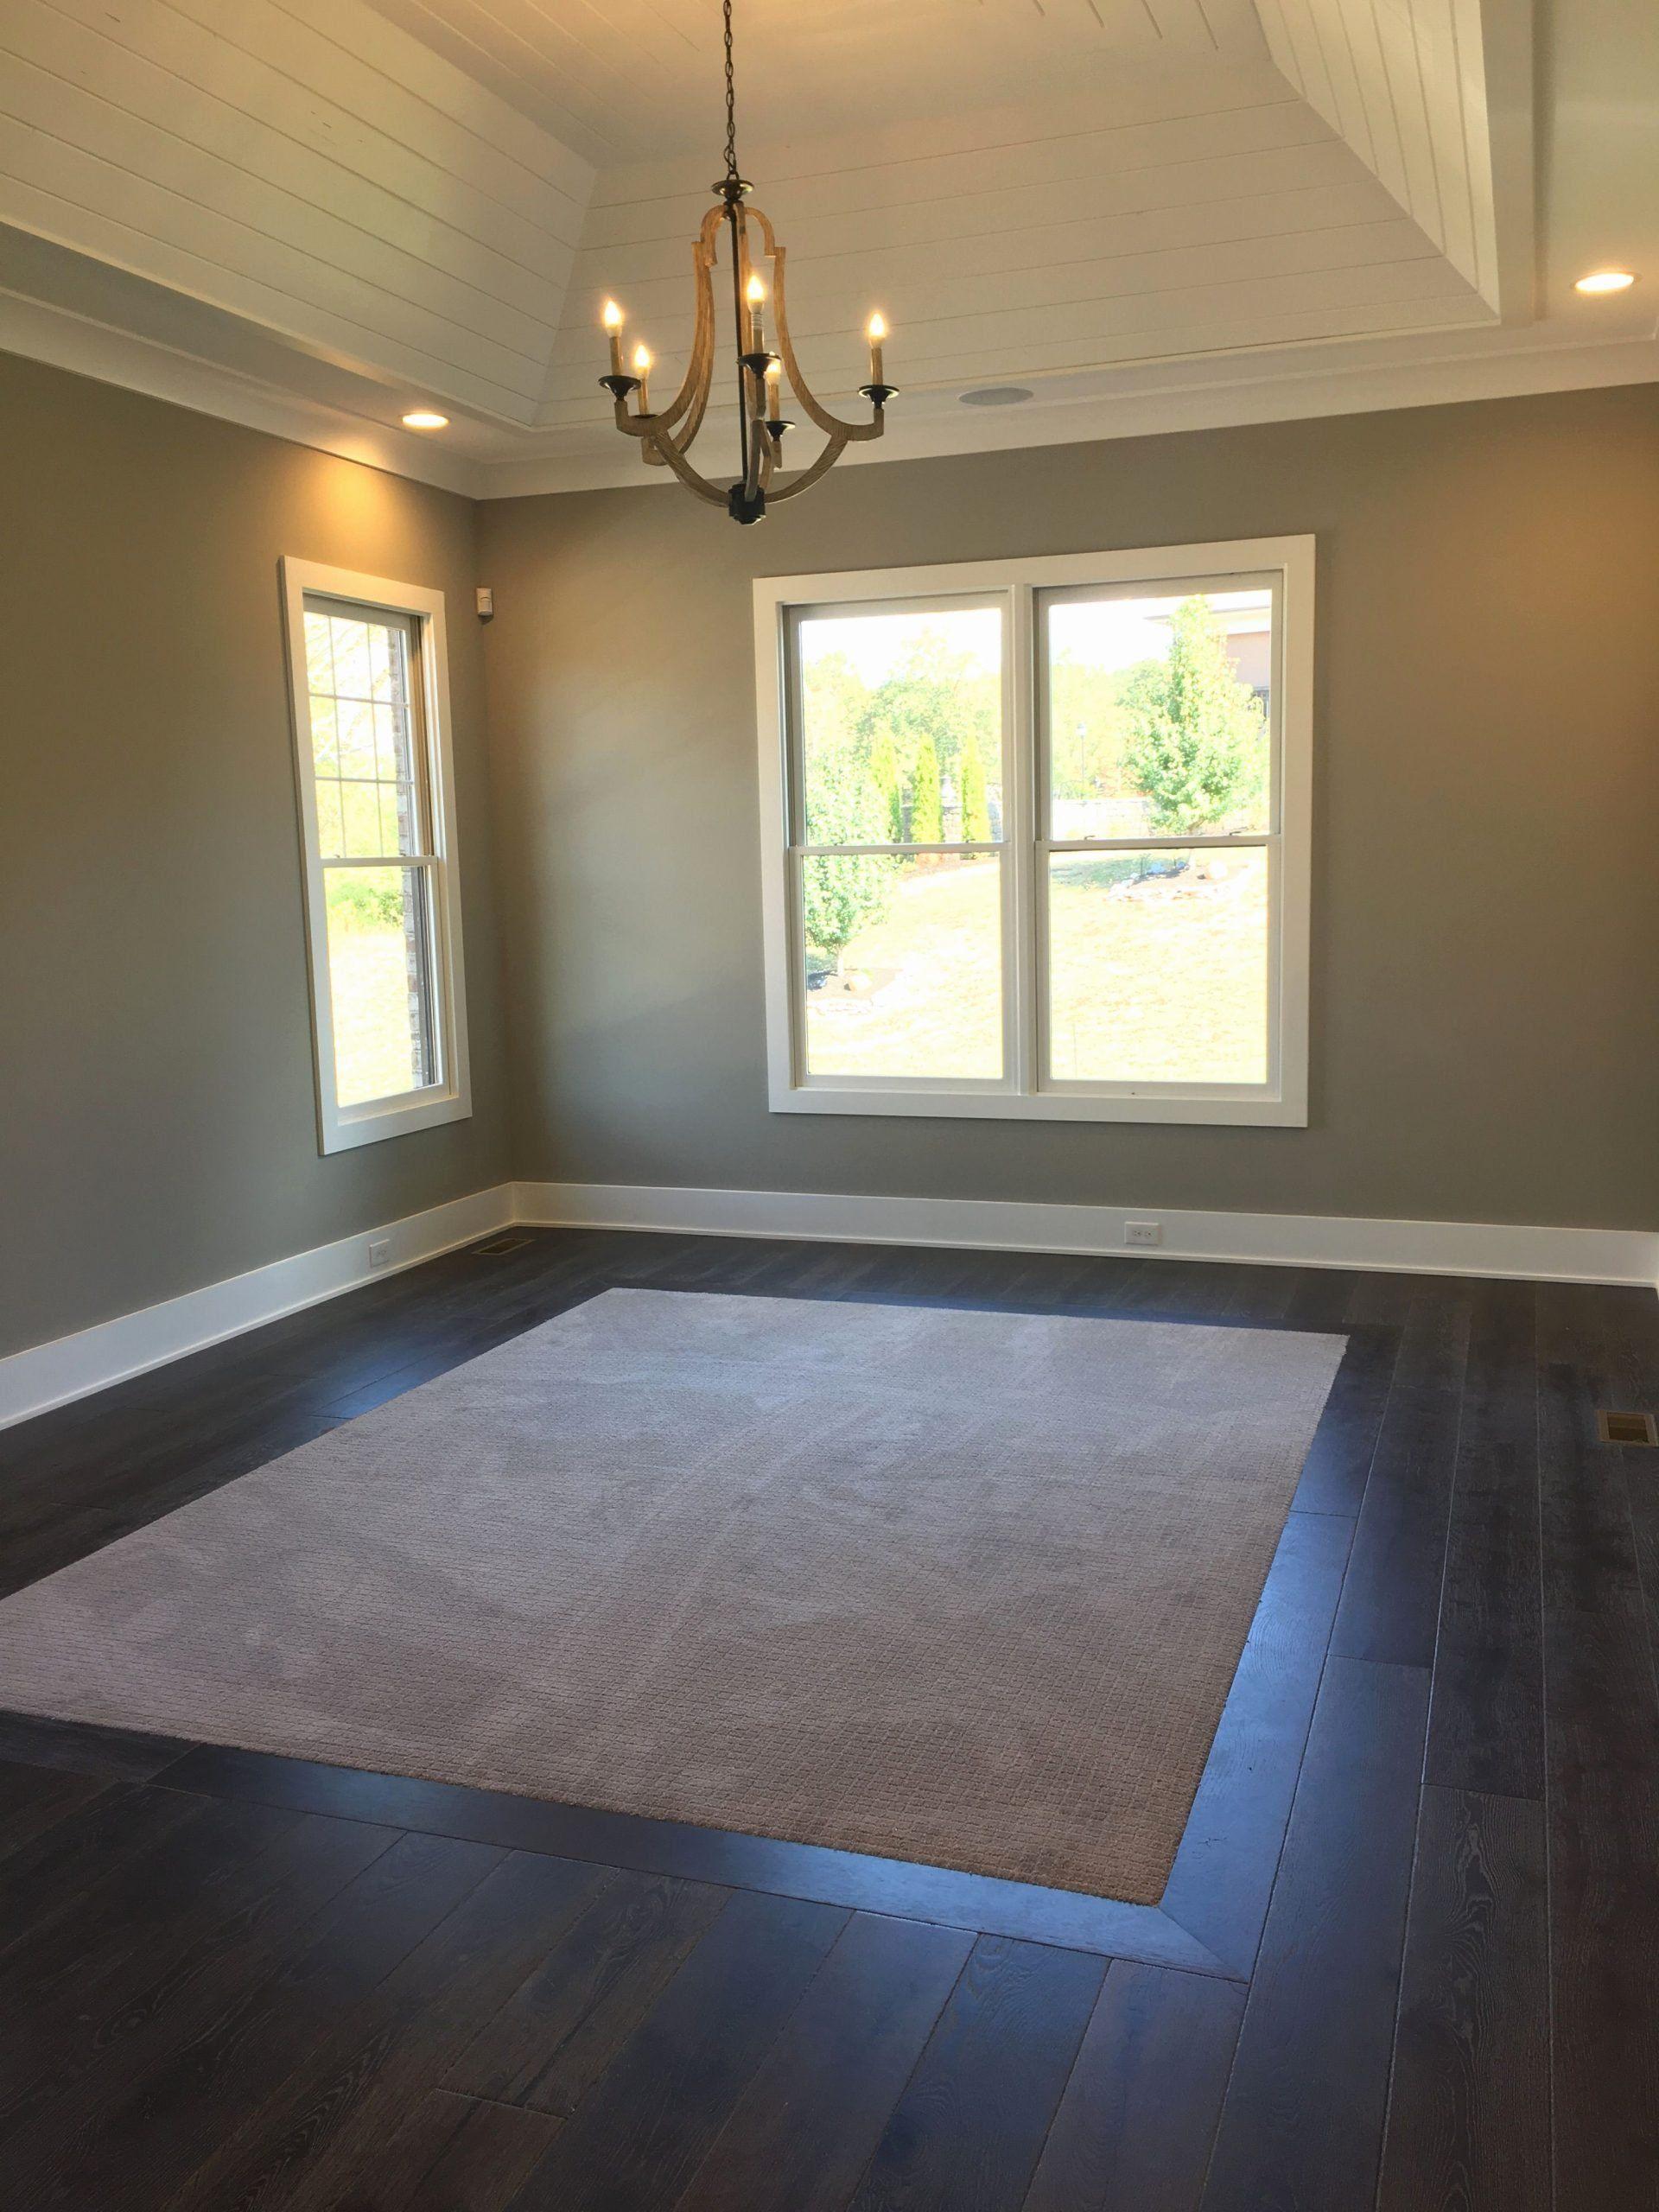 Master Bedroom Flooring Ideas Inspirational Love the